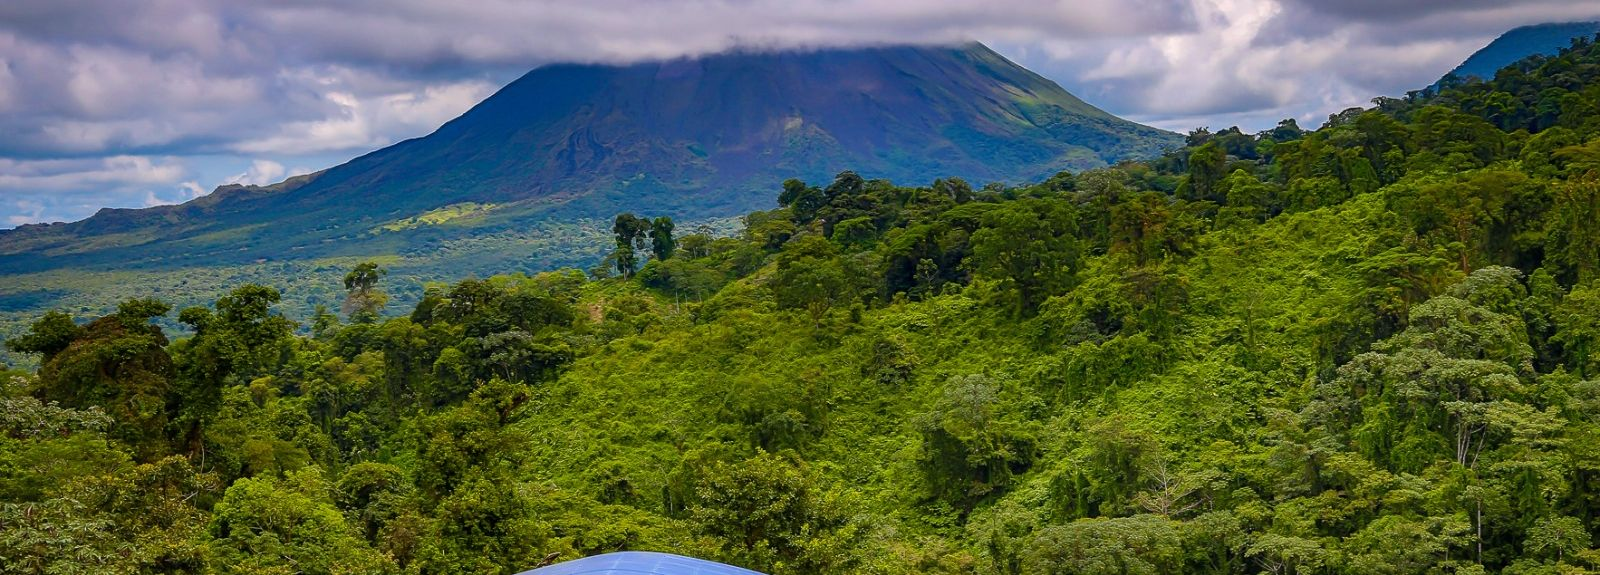 La Fortuna, Alajuela (province), Costa Rica